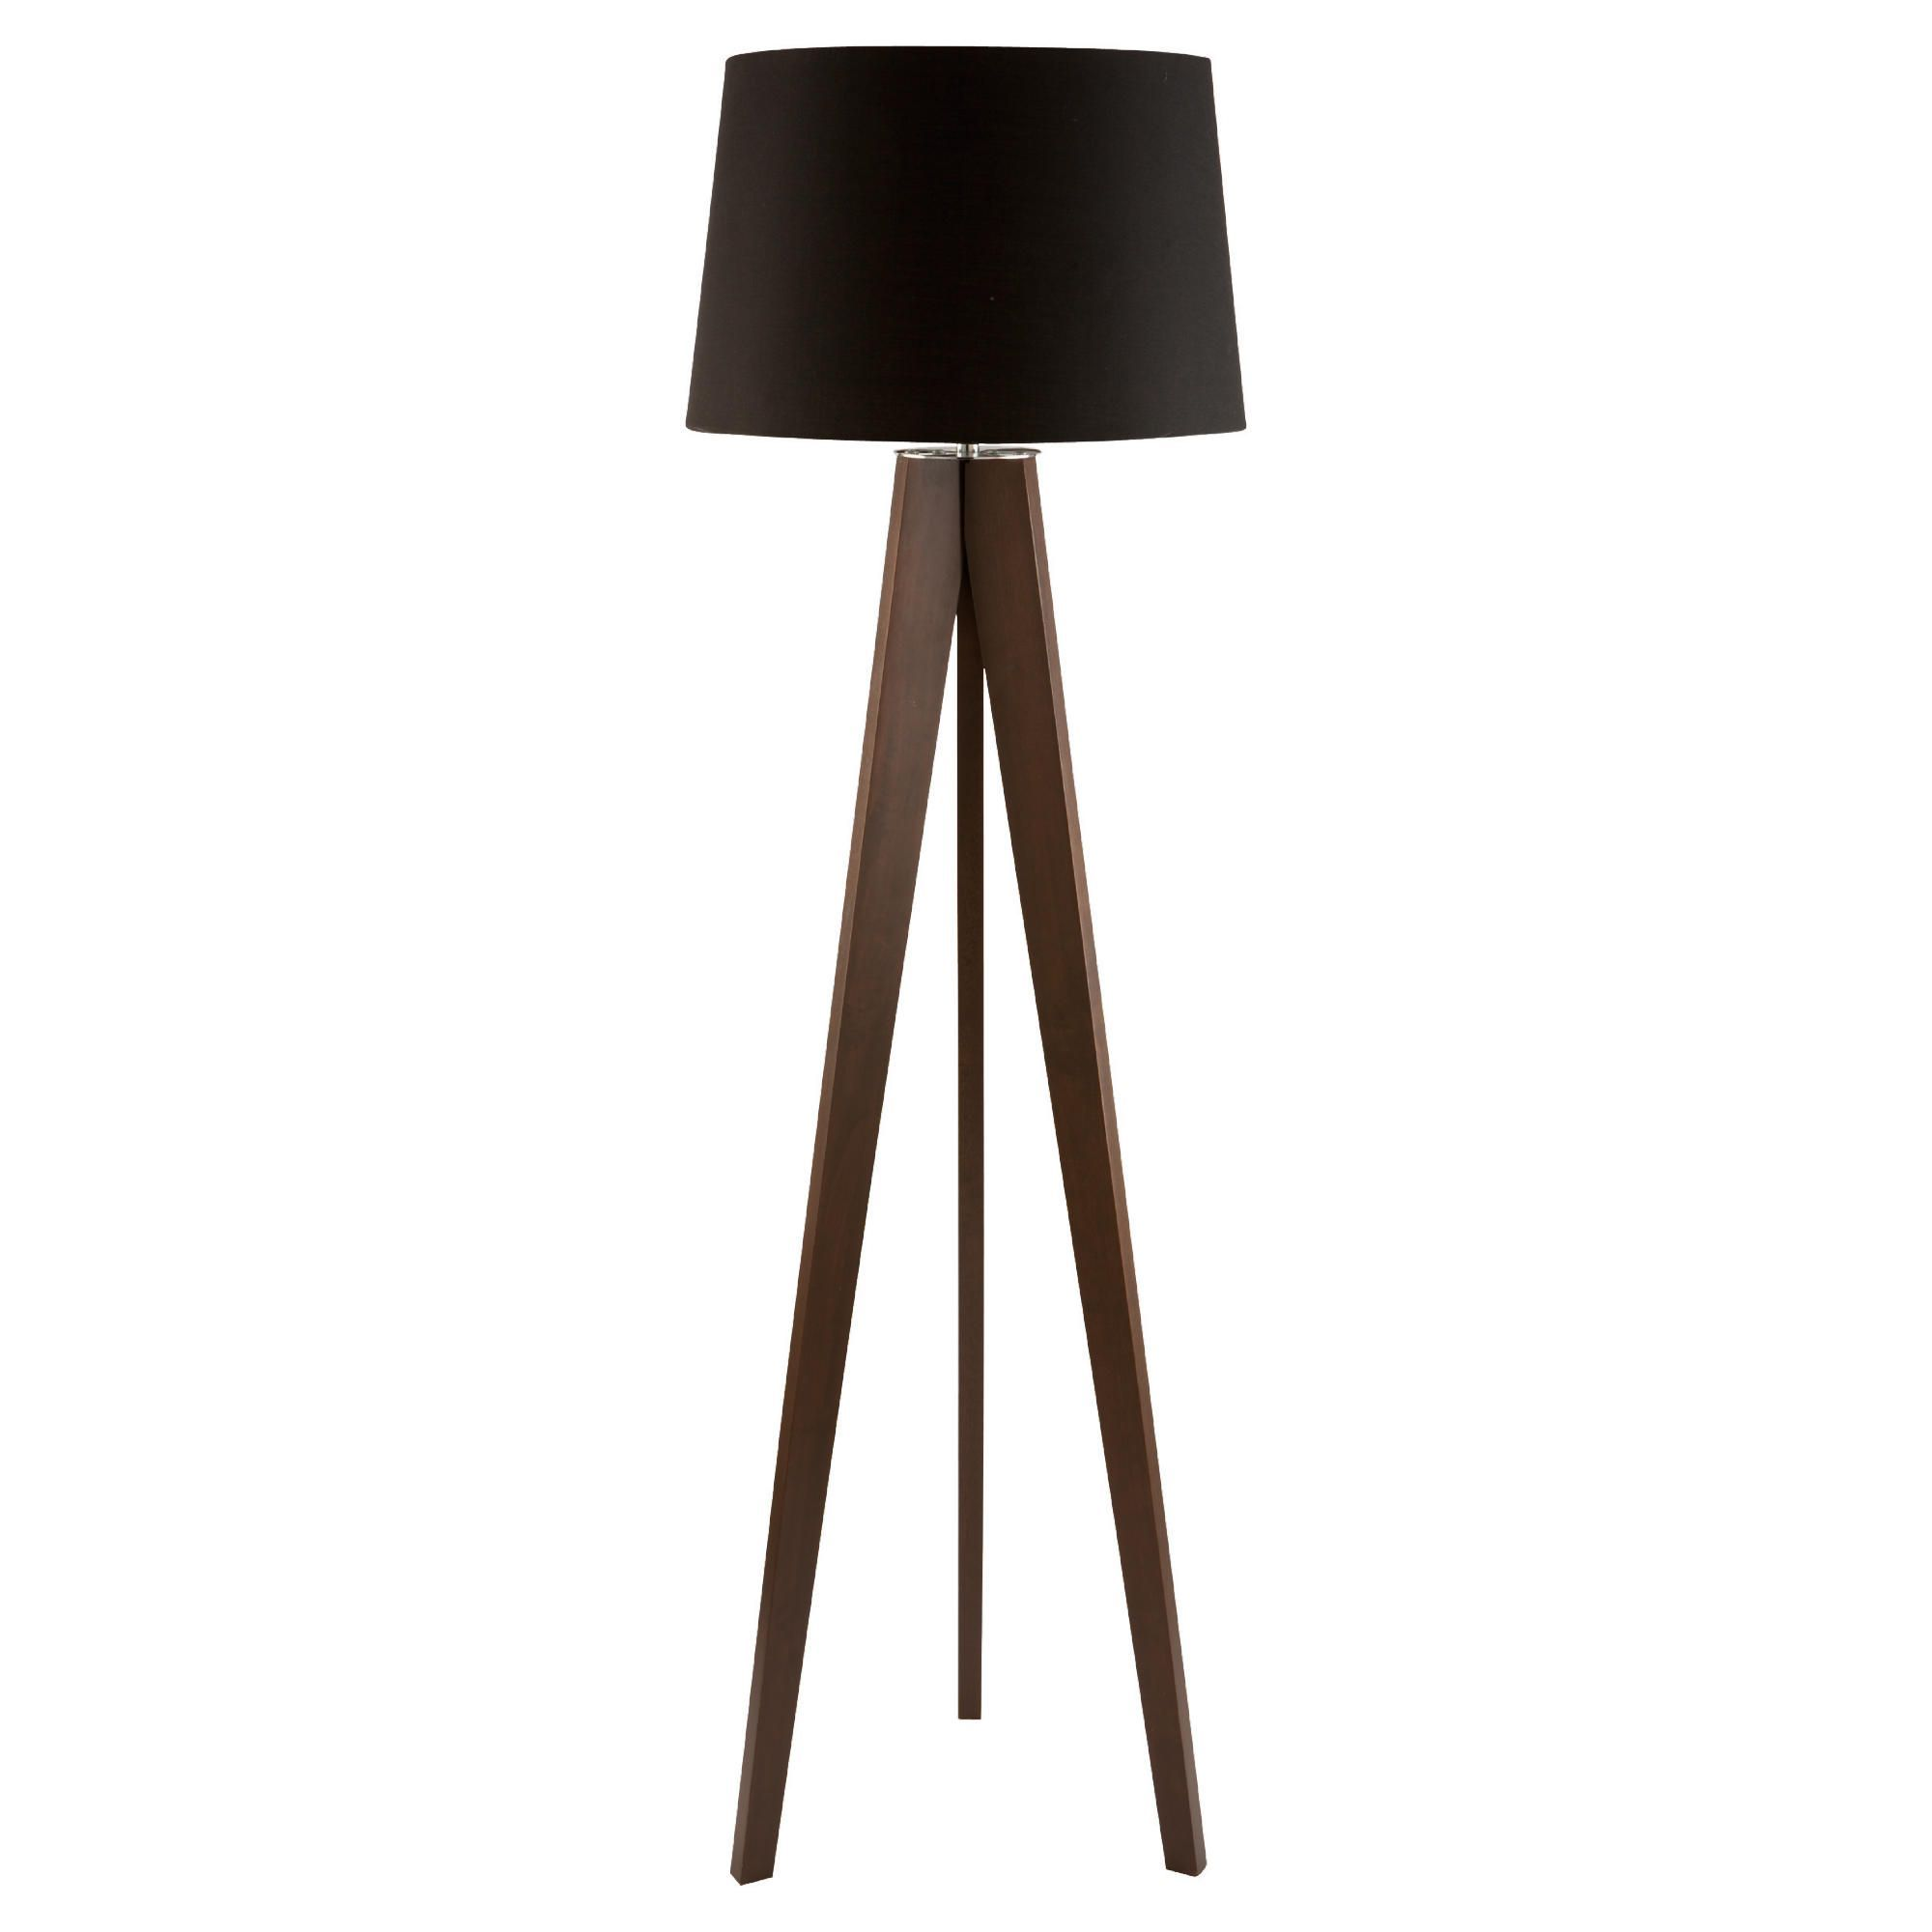 Dark Wood Floor Lamp: Tesco Tripod Wooden Floor Lamp Dark Wood Black Shade,Lighting